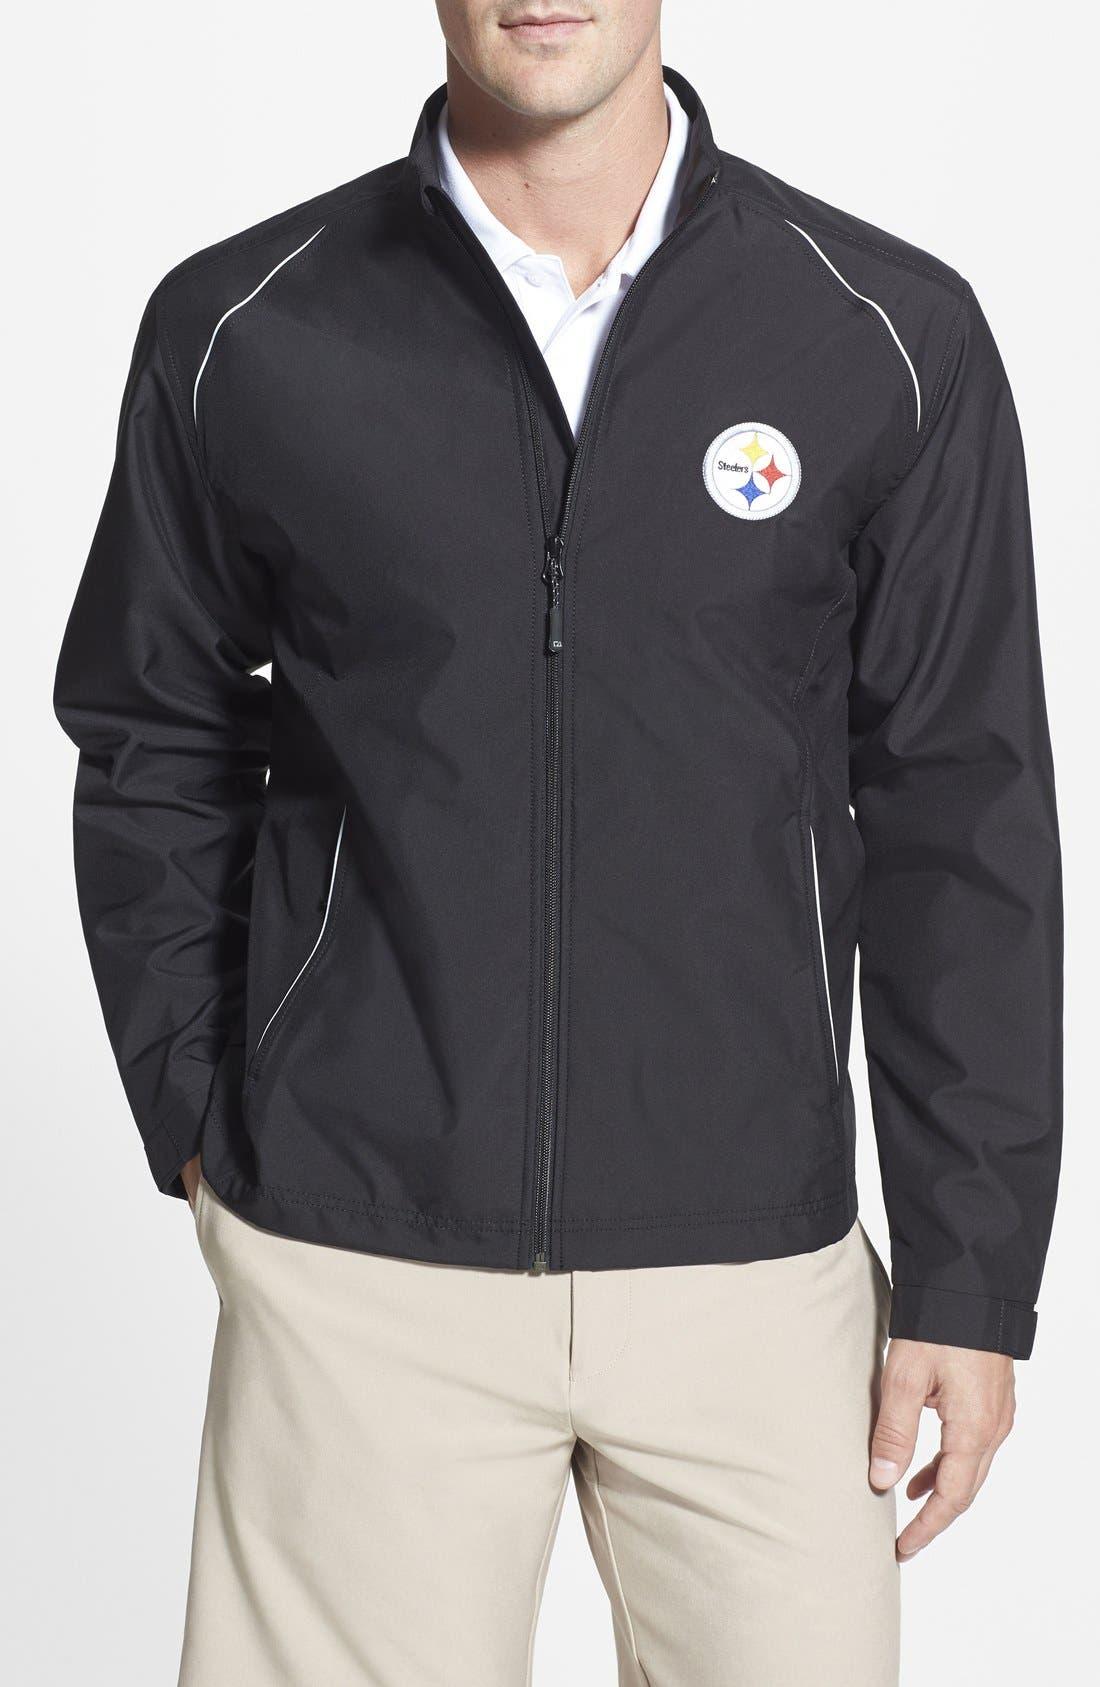 Main Image - Cutter & Buck Pittsburgh Steelers - Beacon WeatherTec Wind & Water Resistant Jacket